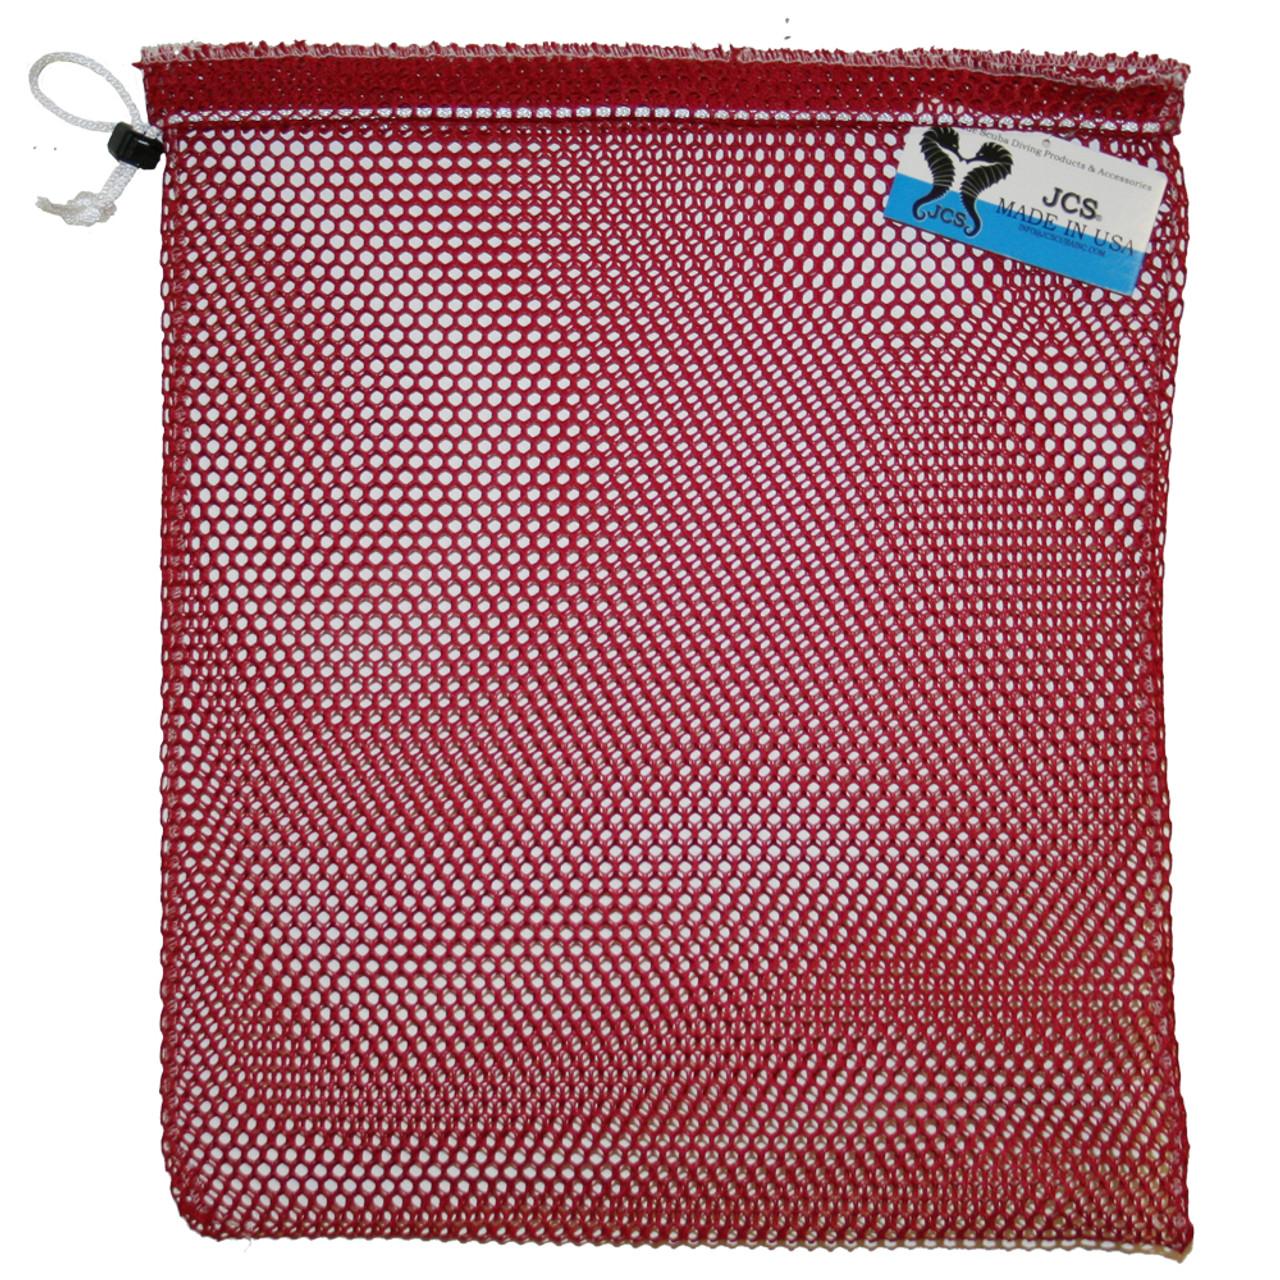 JCS Nylon Mesh Drawstring Bag 745c98be0083